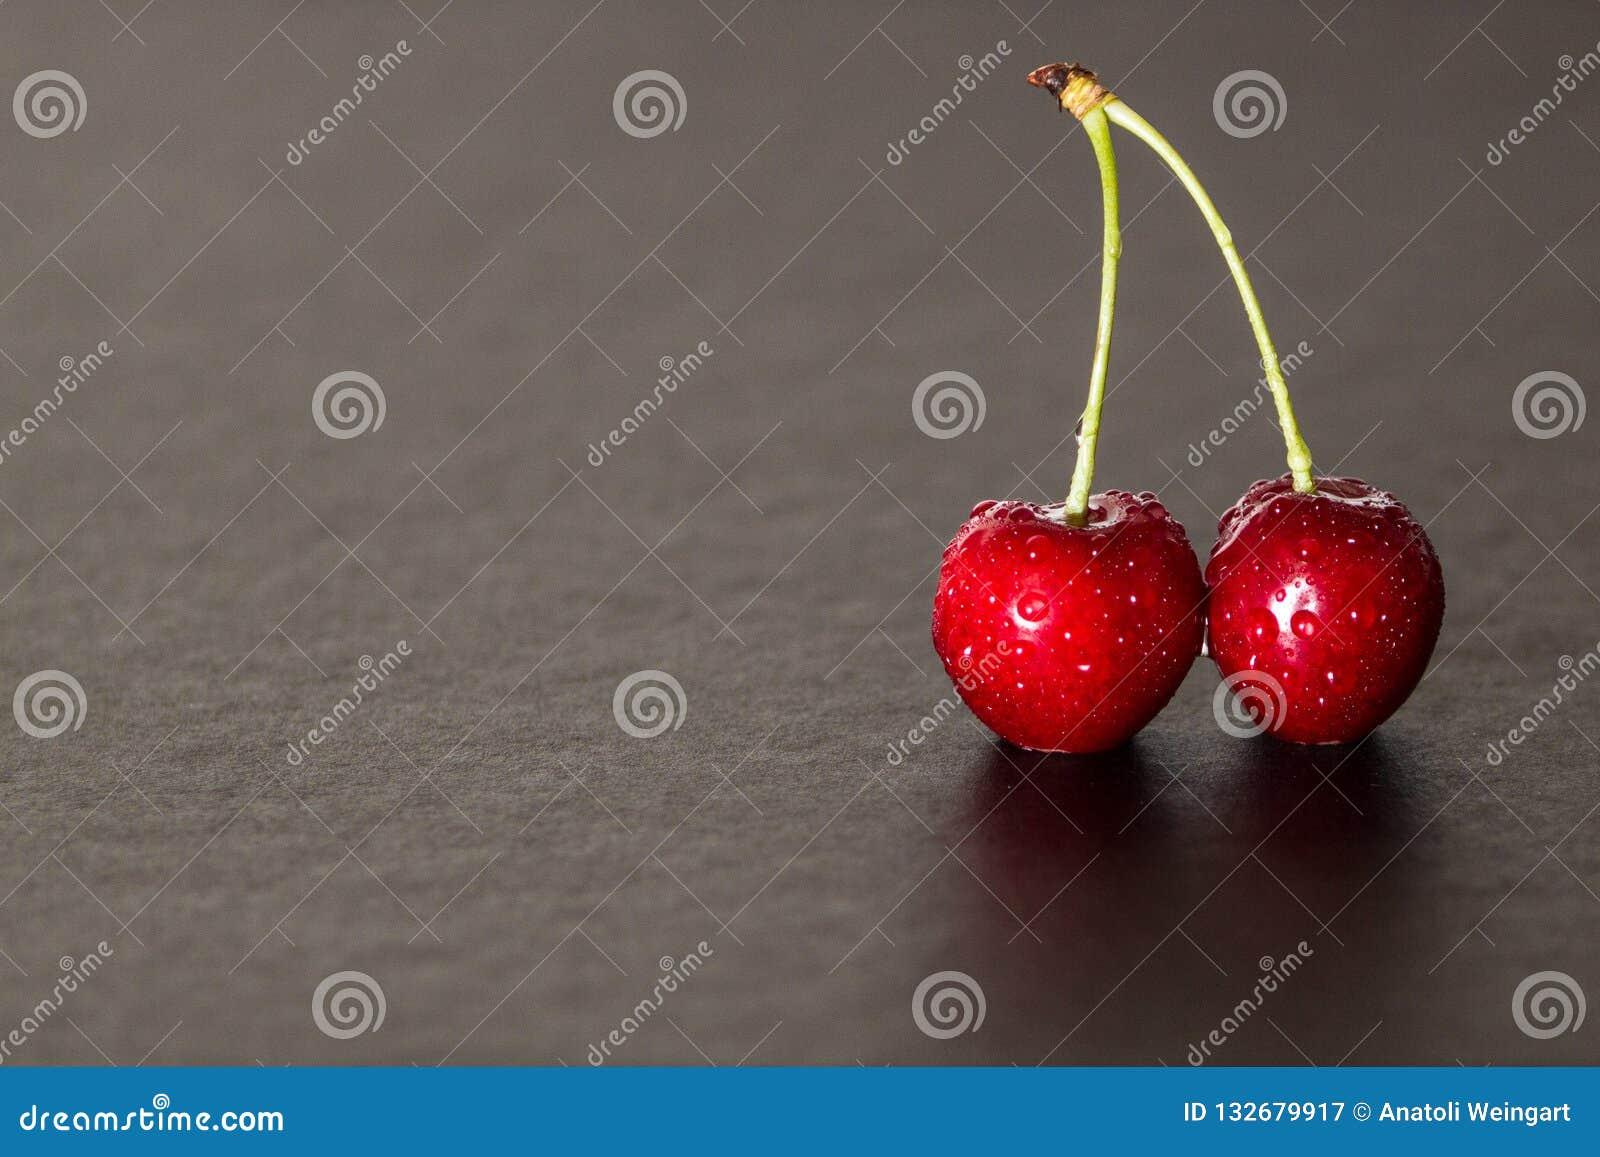 Ciliege rosse con la sgocciolatura